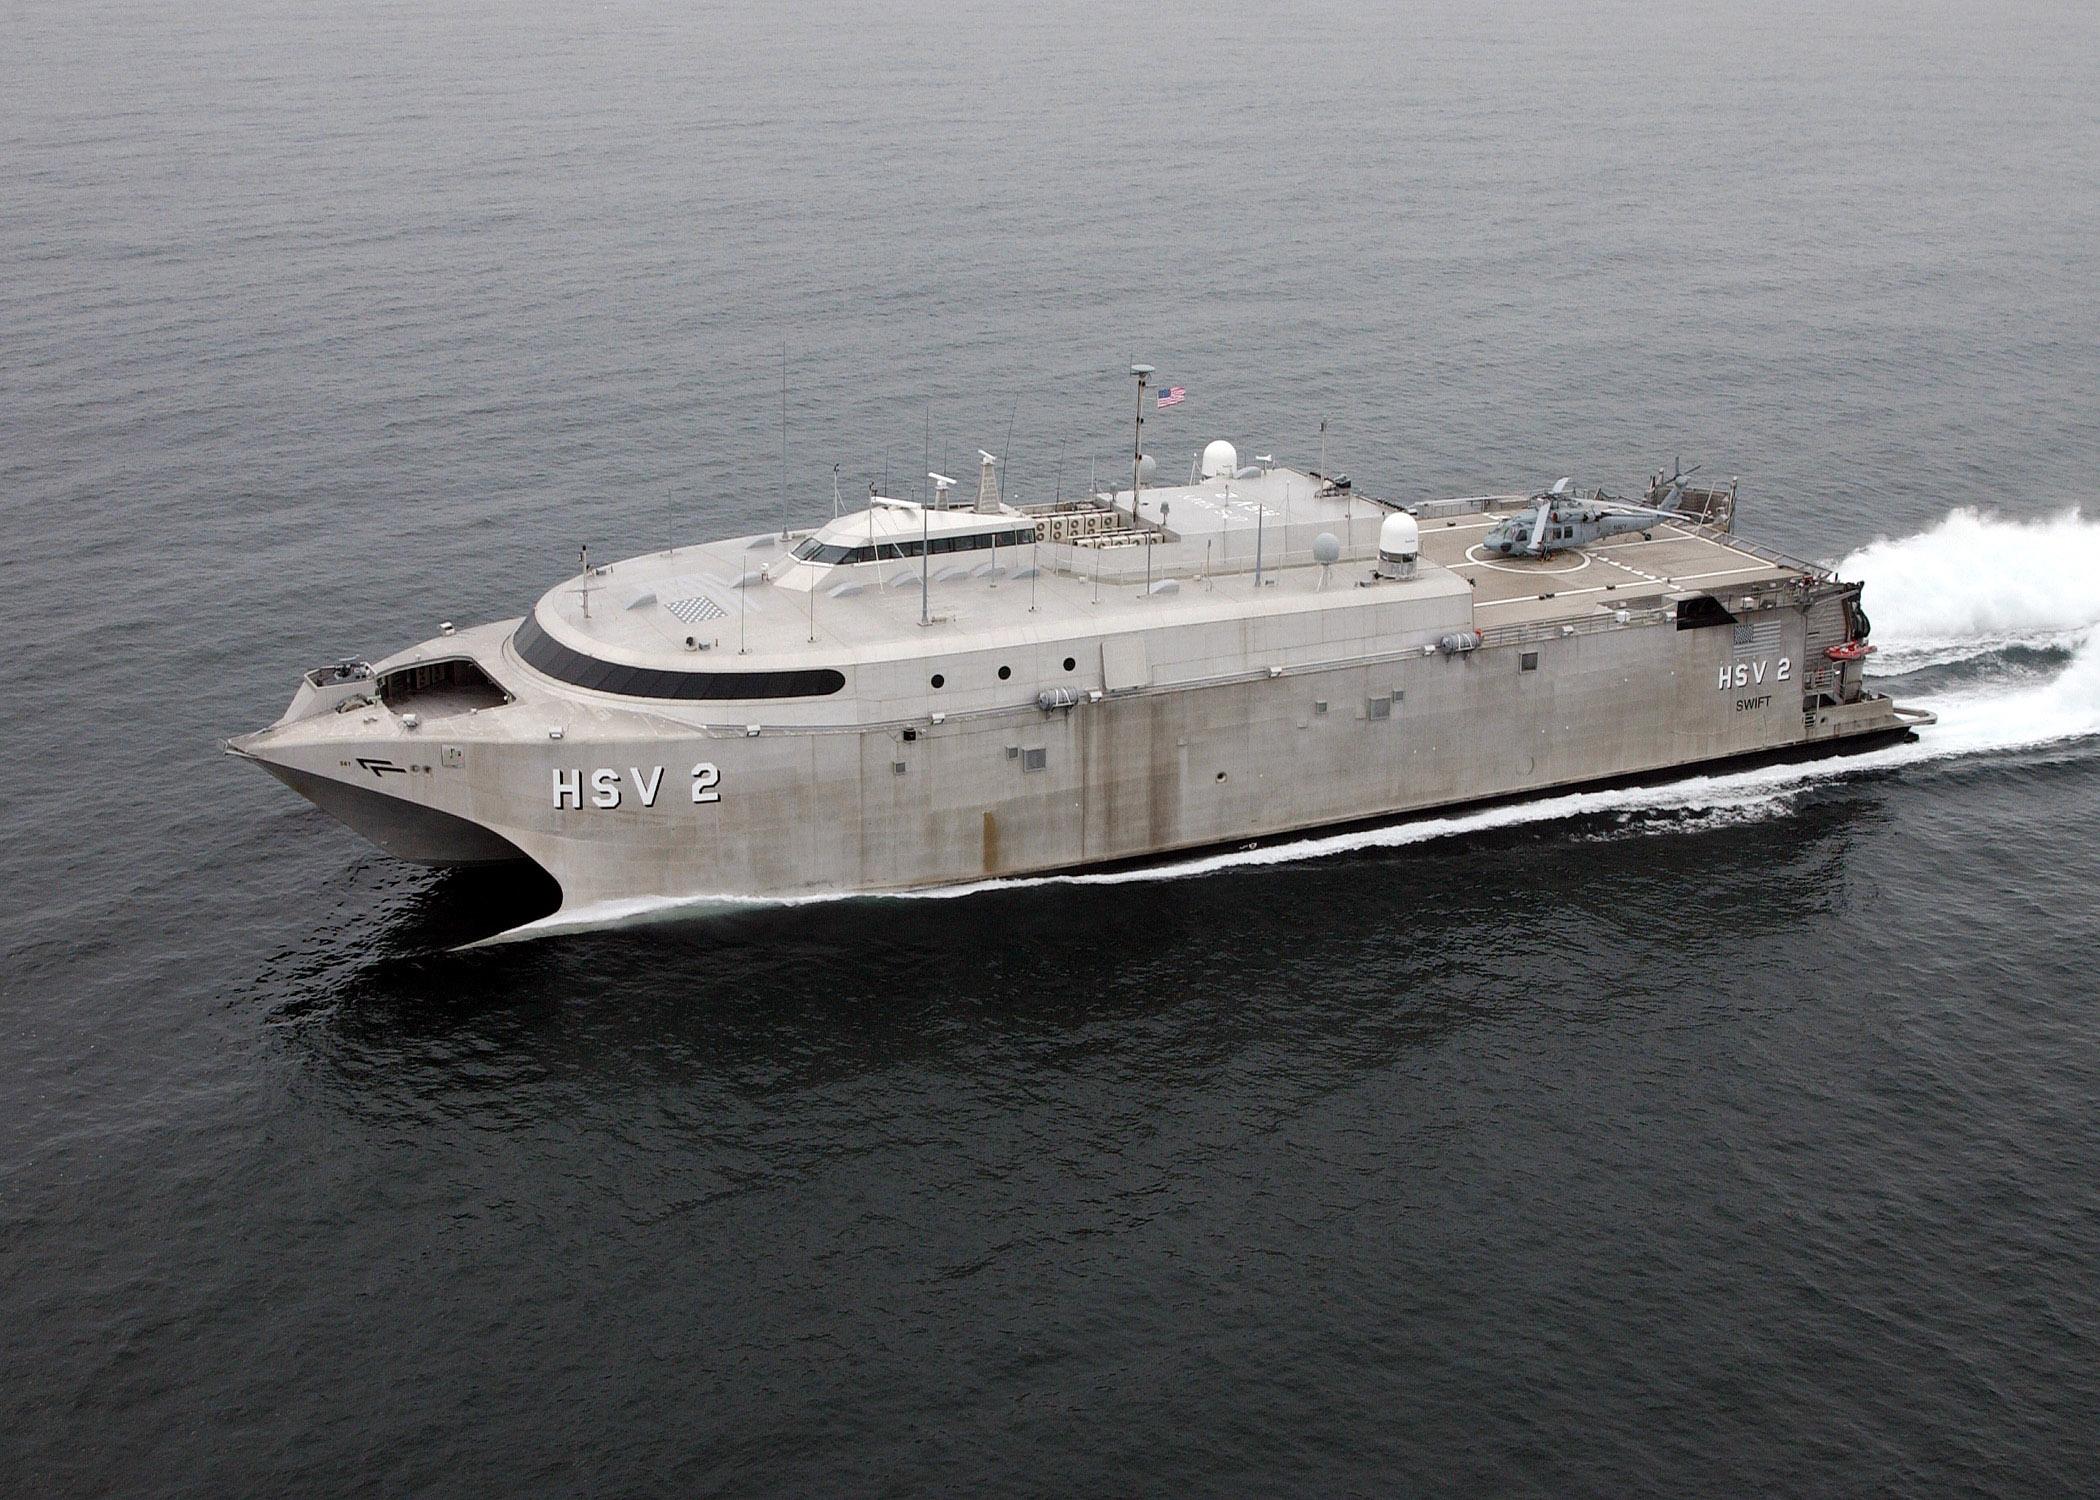 fileus navy 040210n4374s002 high speed vessel two hsv